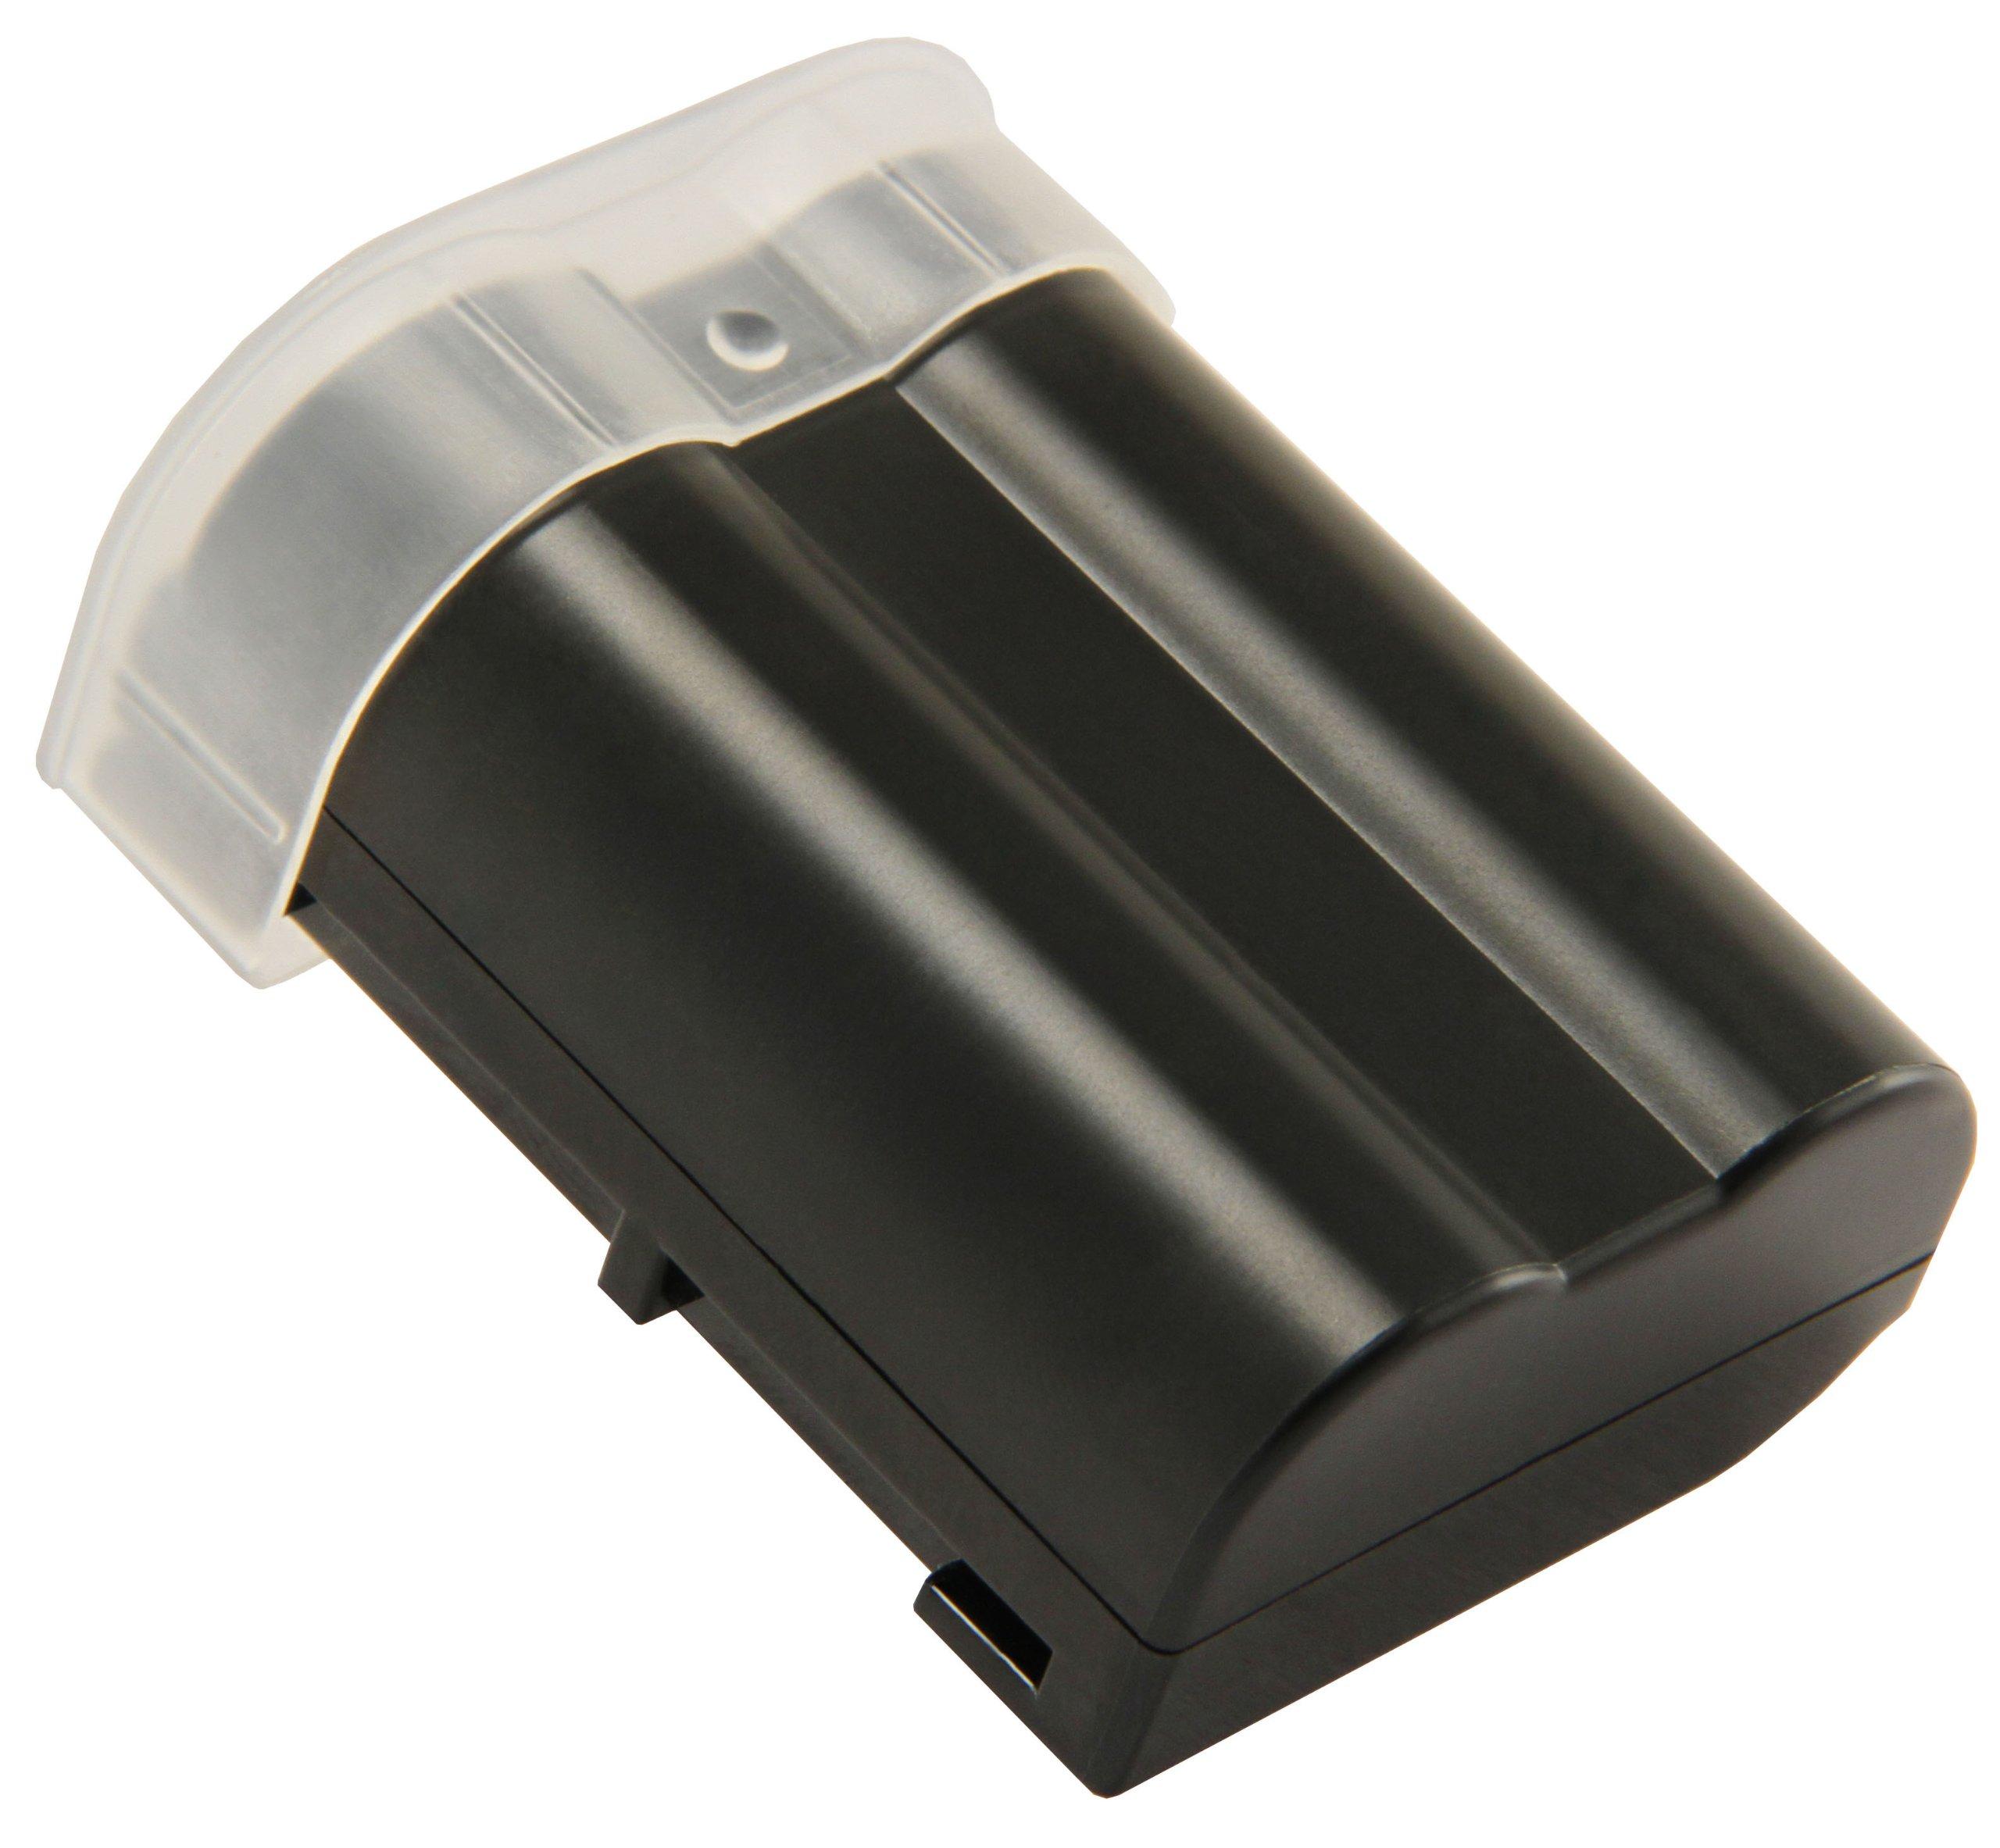 STK EN-EL15 EN-EL15a Battery for Nikon D7000, D7100, D7200, D850, D750, Nikon D7500 Battery, D810, D500, D800, D610, D600 Compatible Nikon EN-EL15b Battery by STK/SterlingTek